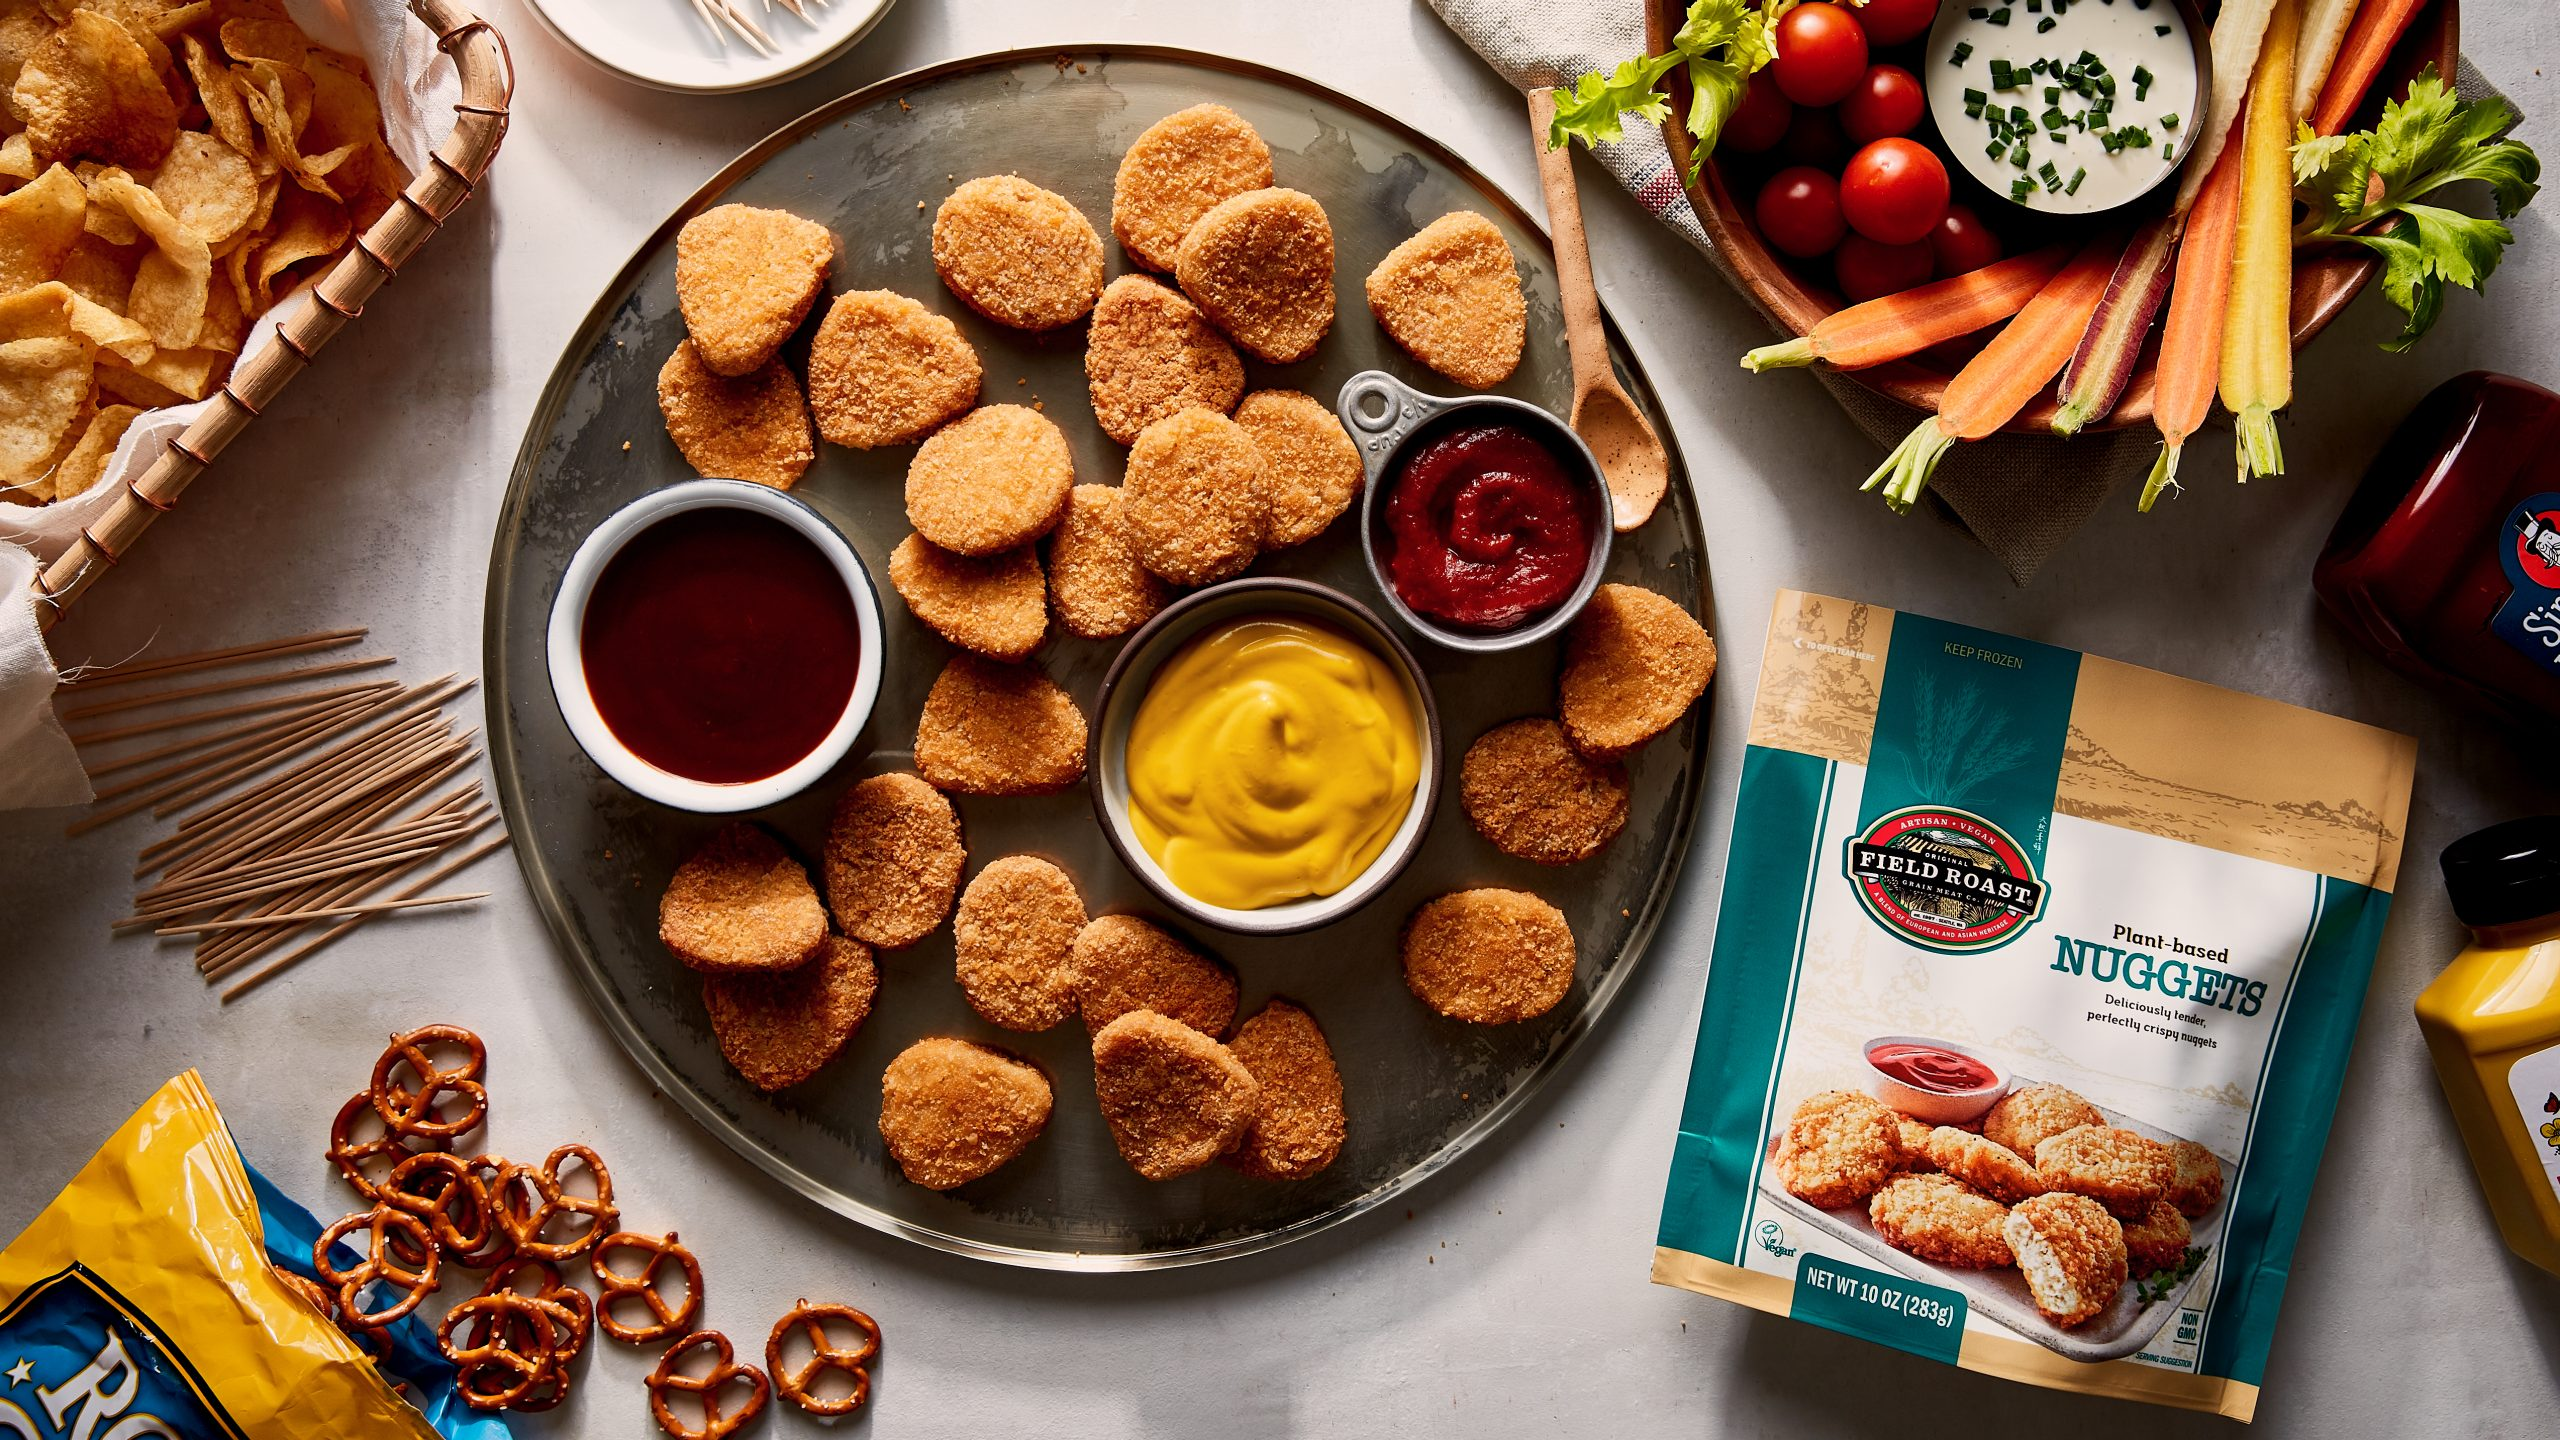 Field Roast plant-based nuggets